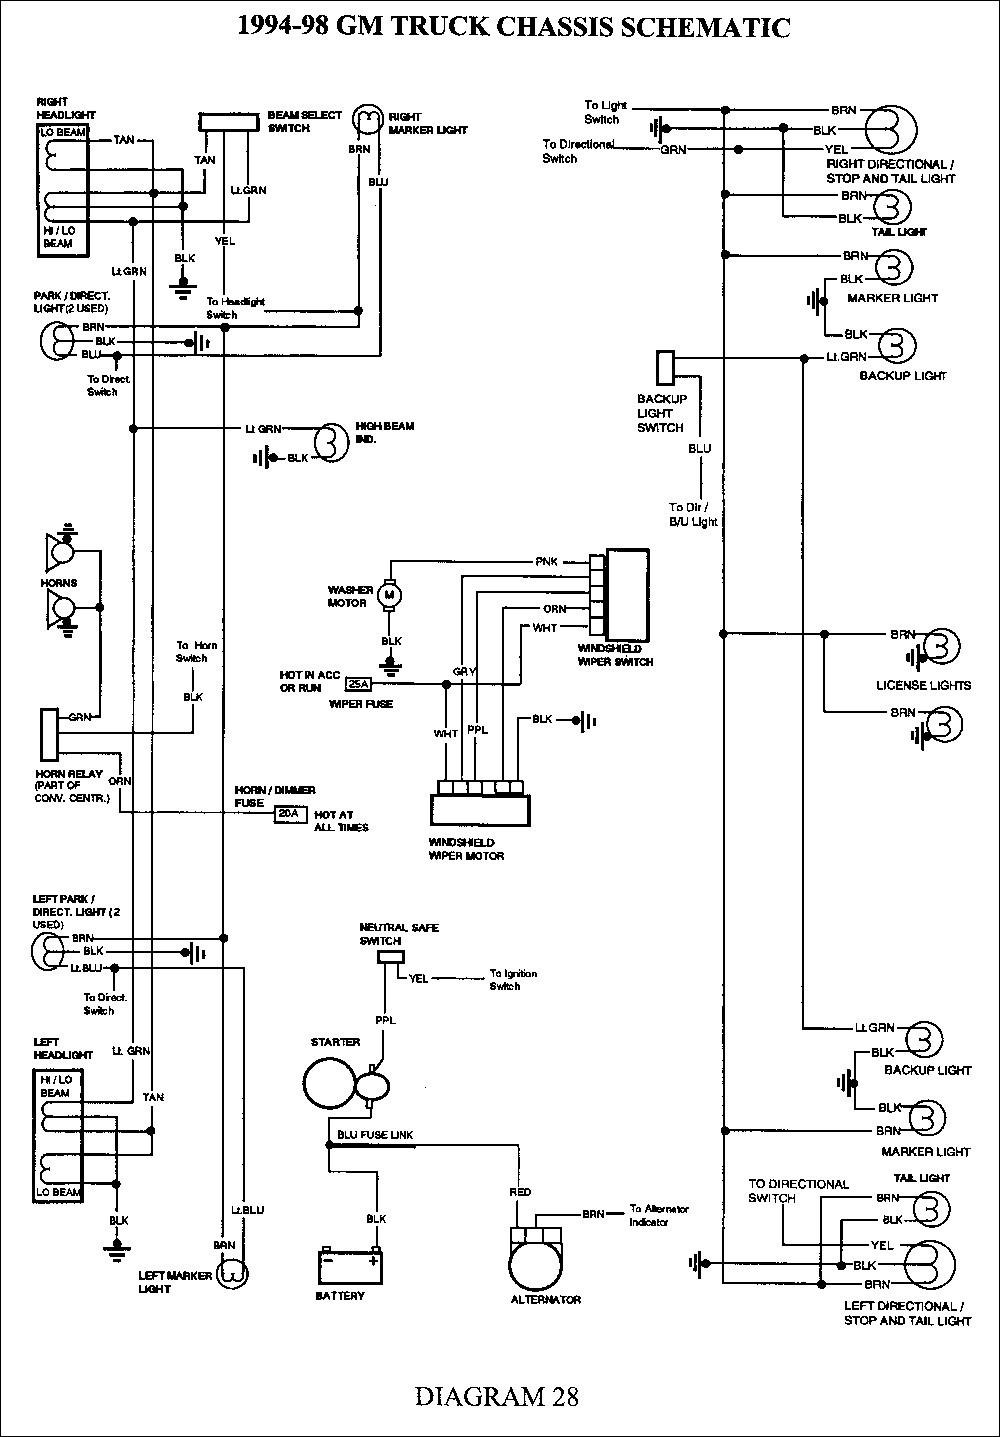 2004 Chevy Colorado Trailer Wiring Diagram - Data Wiring Diagram - 2004 Chevy Silverado Trailer Wiring Diagram